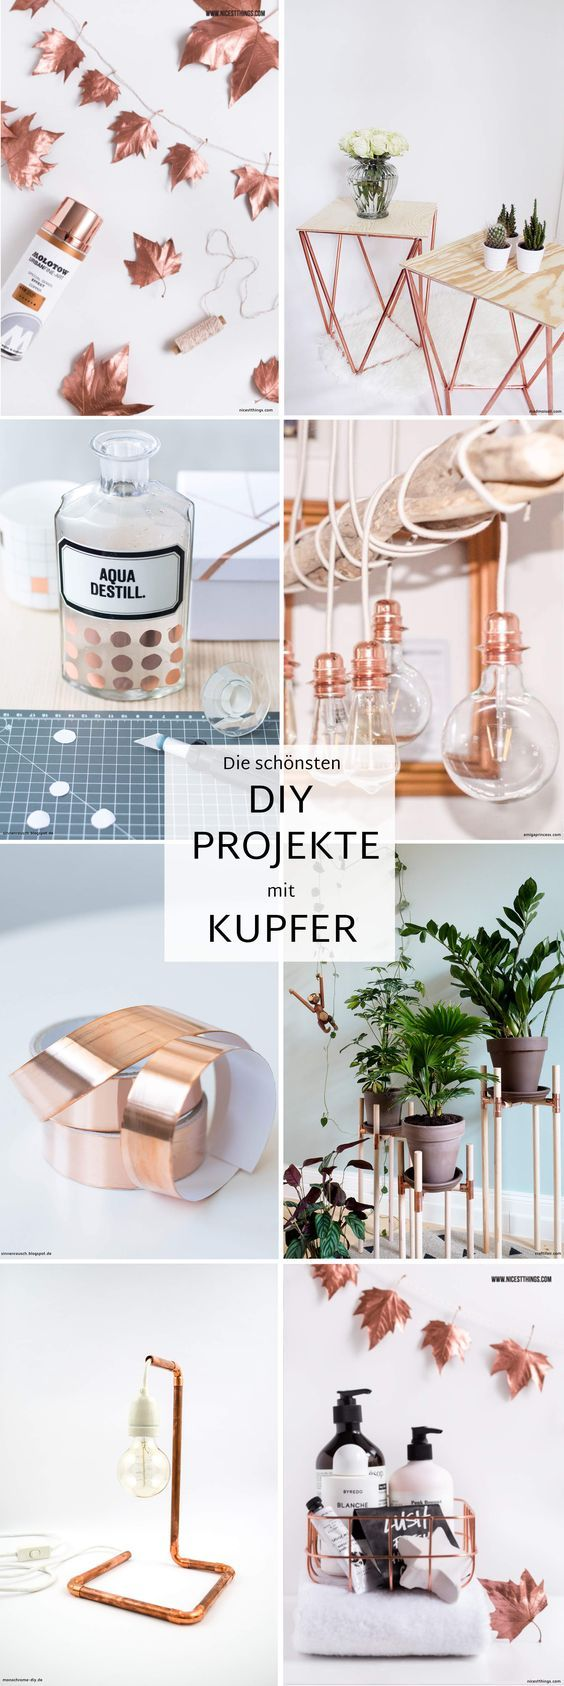 Best 25 copper art ideas on pinterest for Deko geschenke